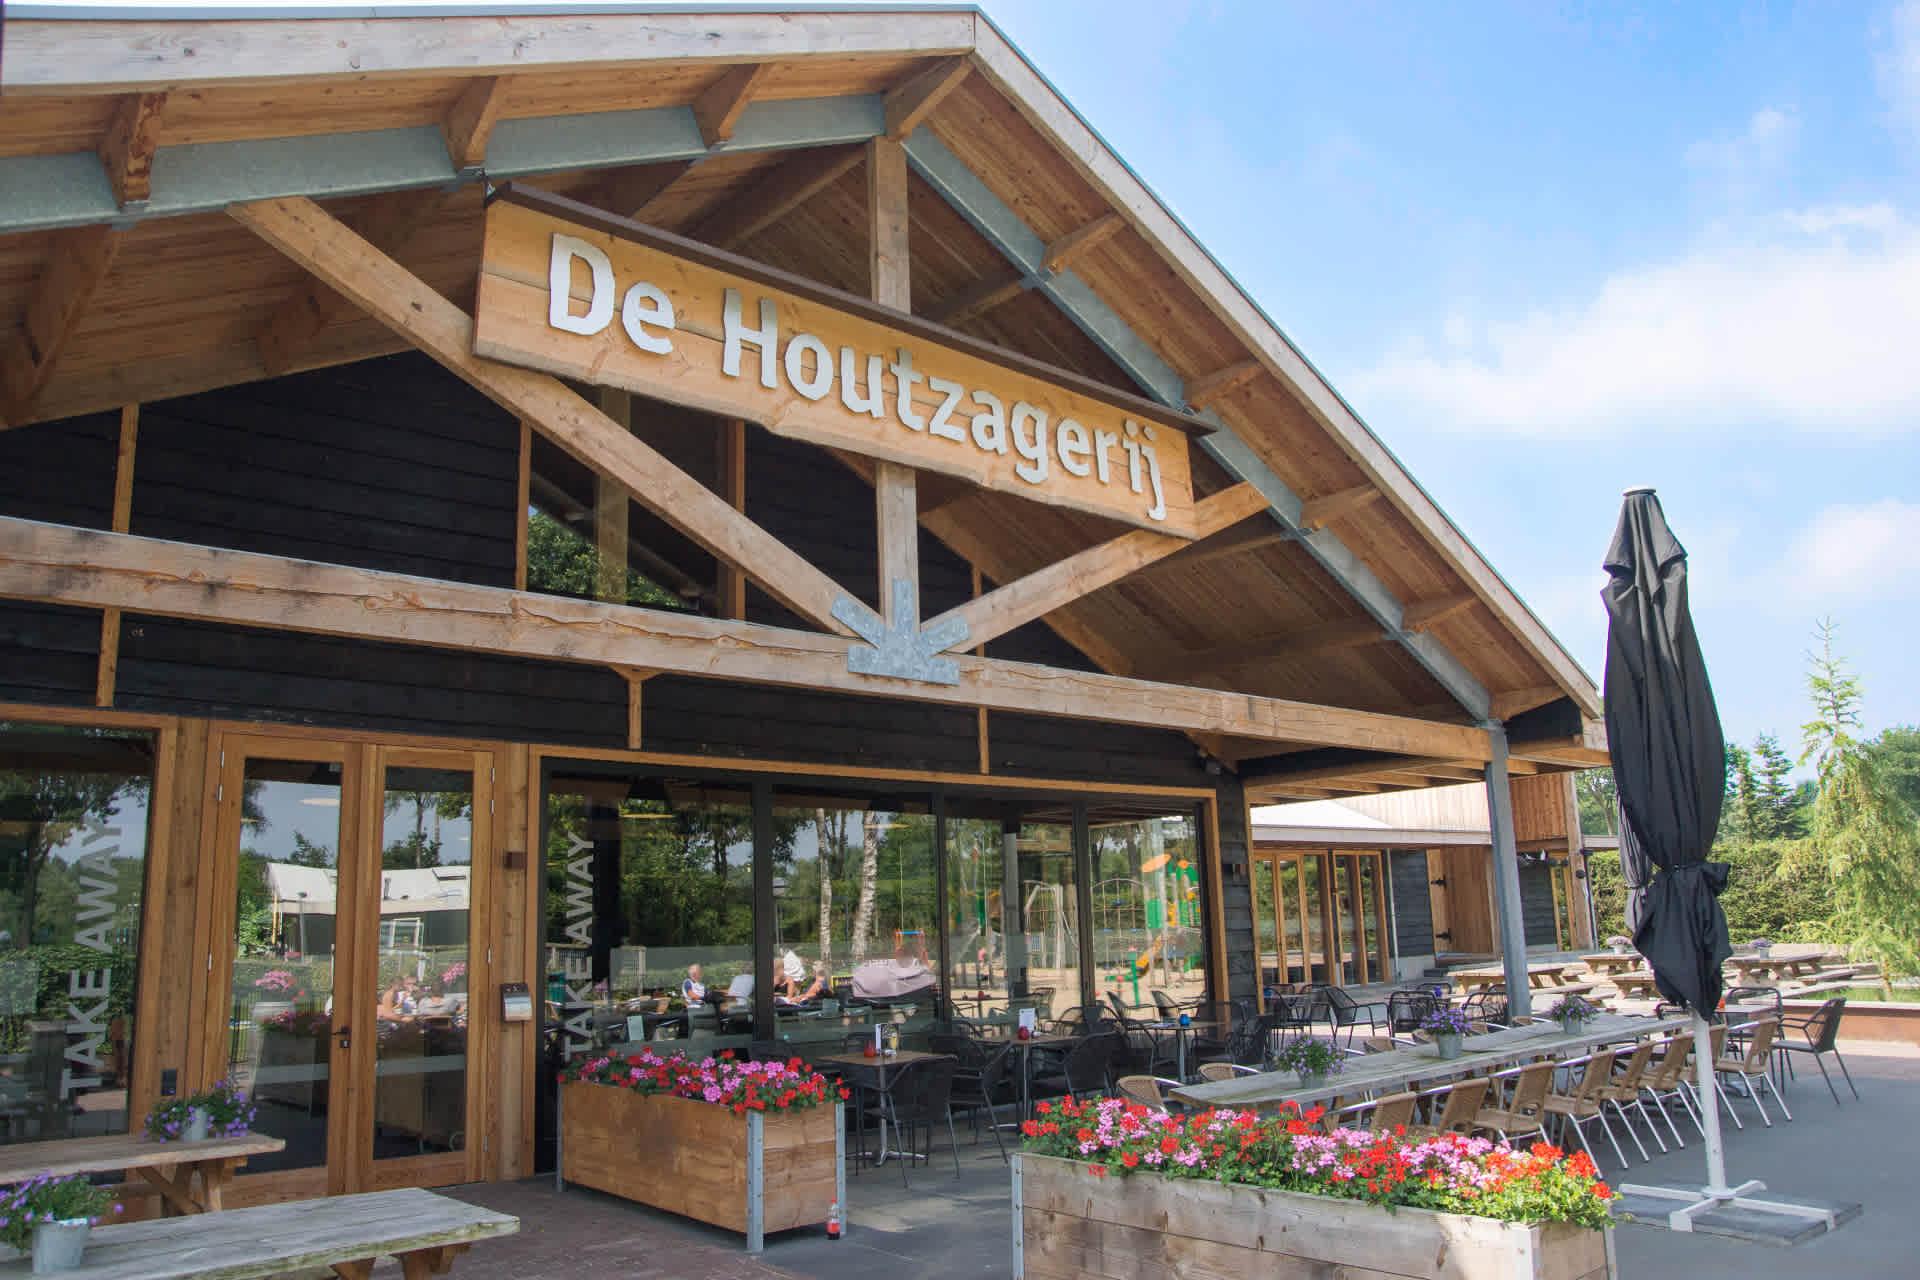 Familie restaurant De Houtzagerij